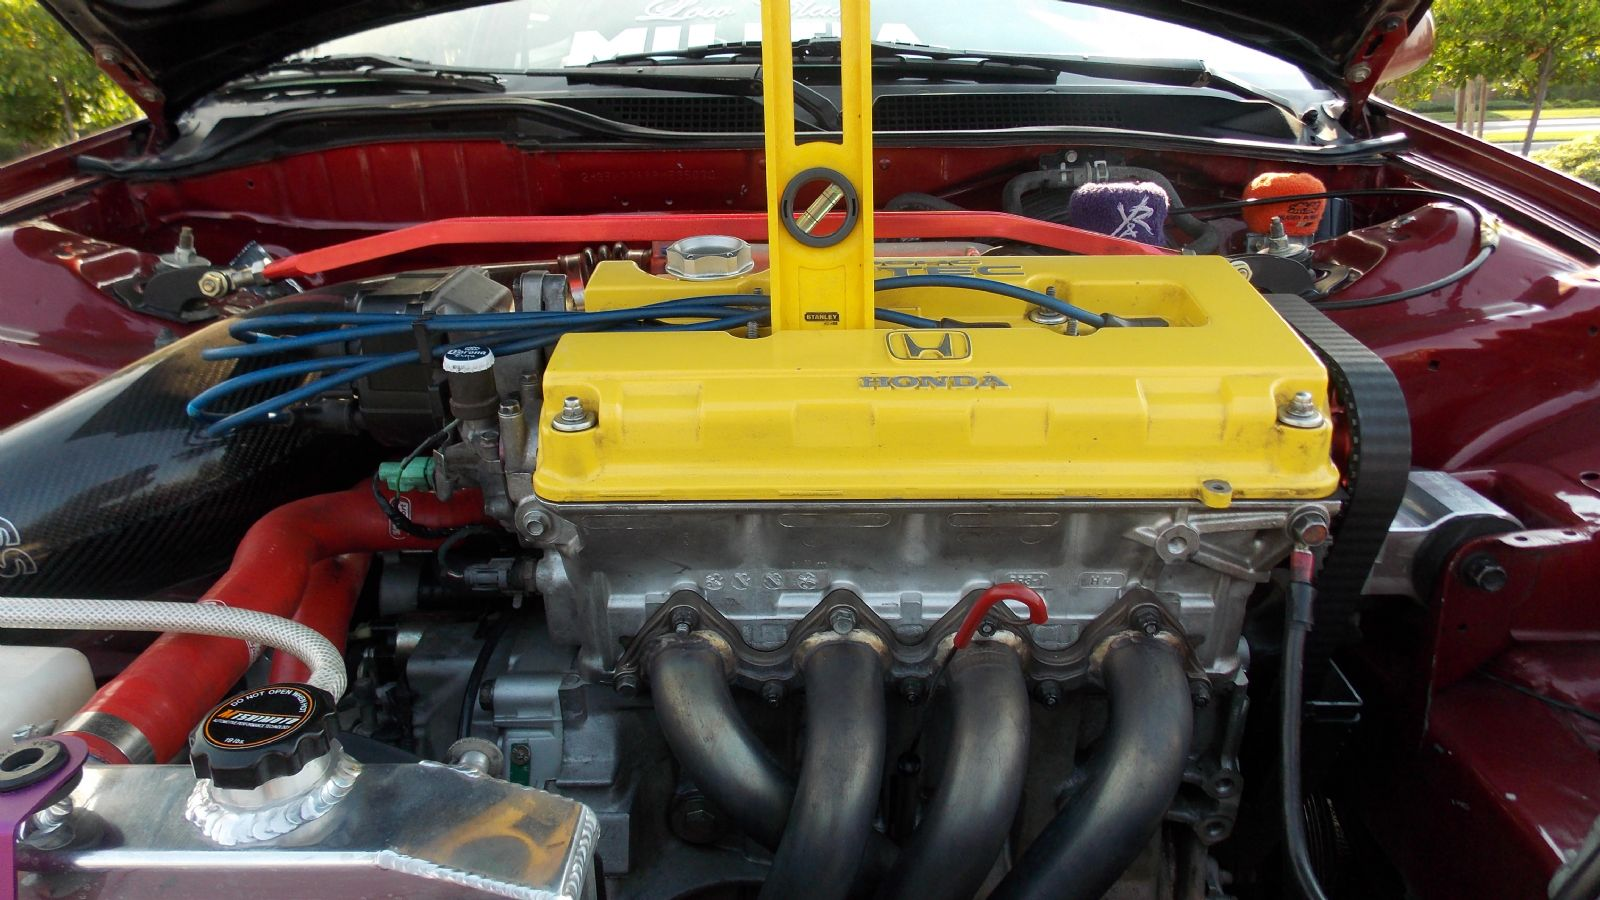 1993 Honda Eg Civic Si For Sale Moreno Valley California